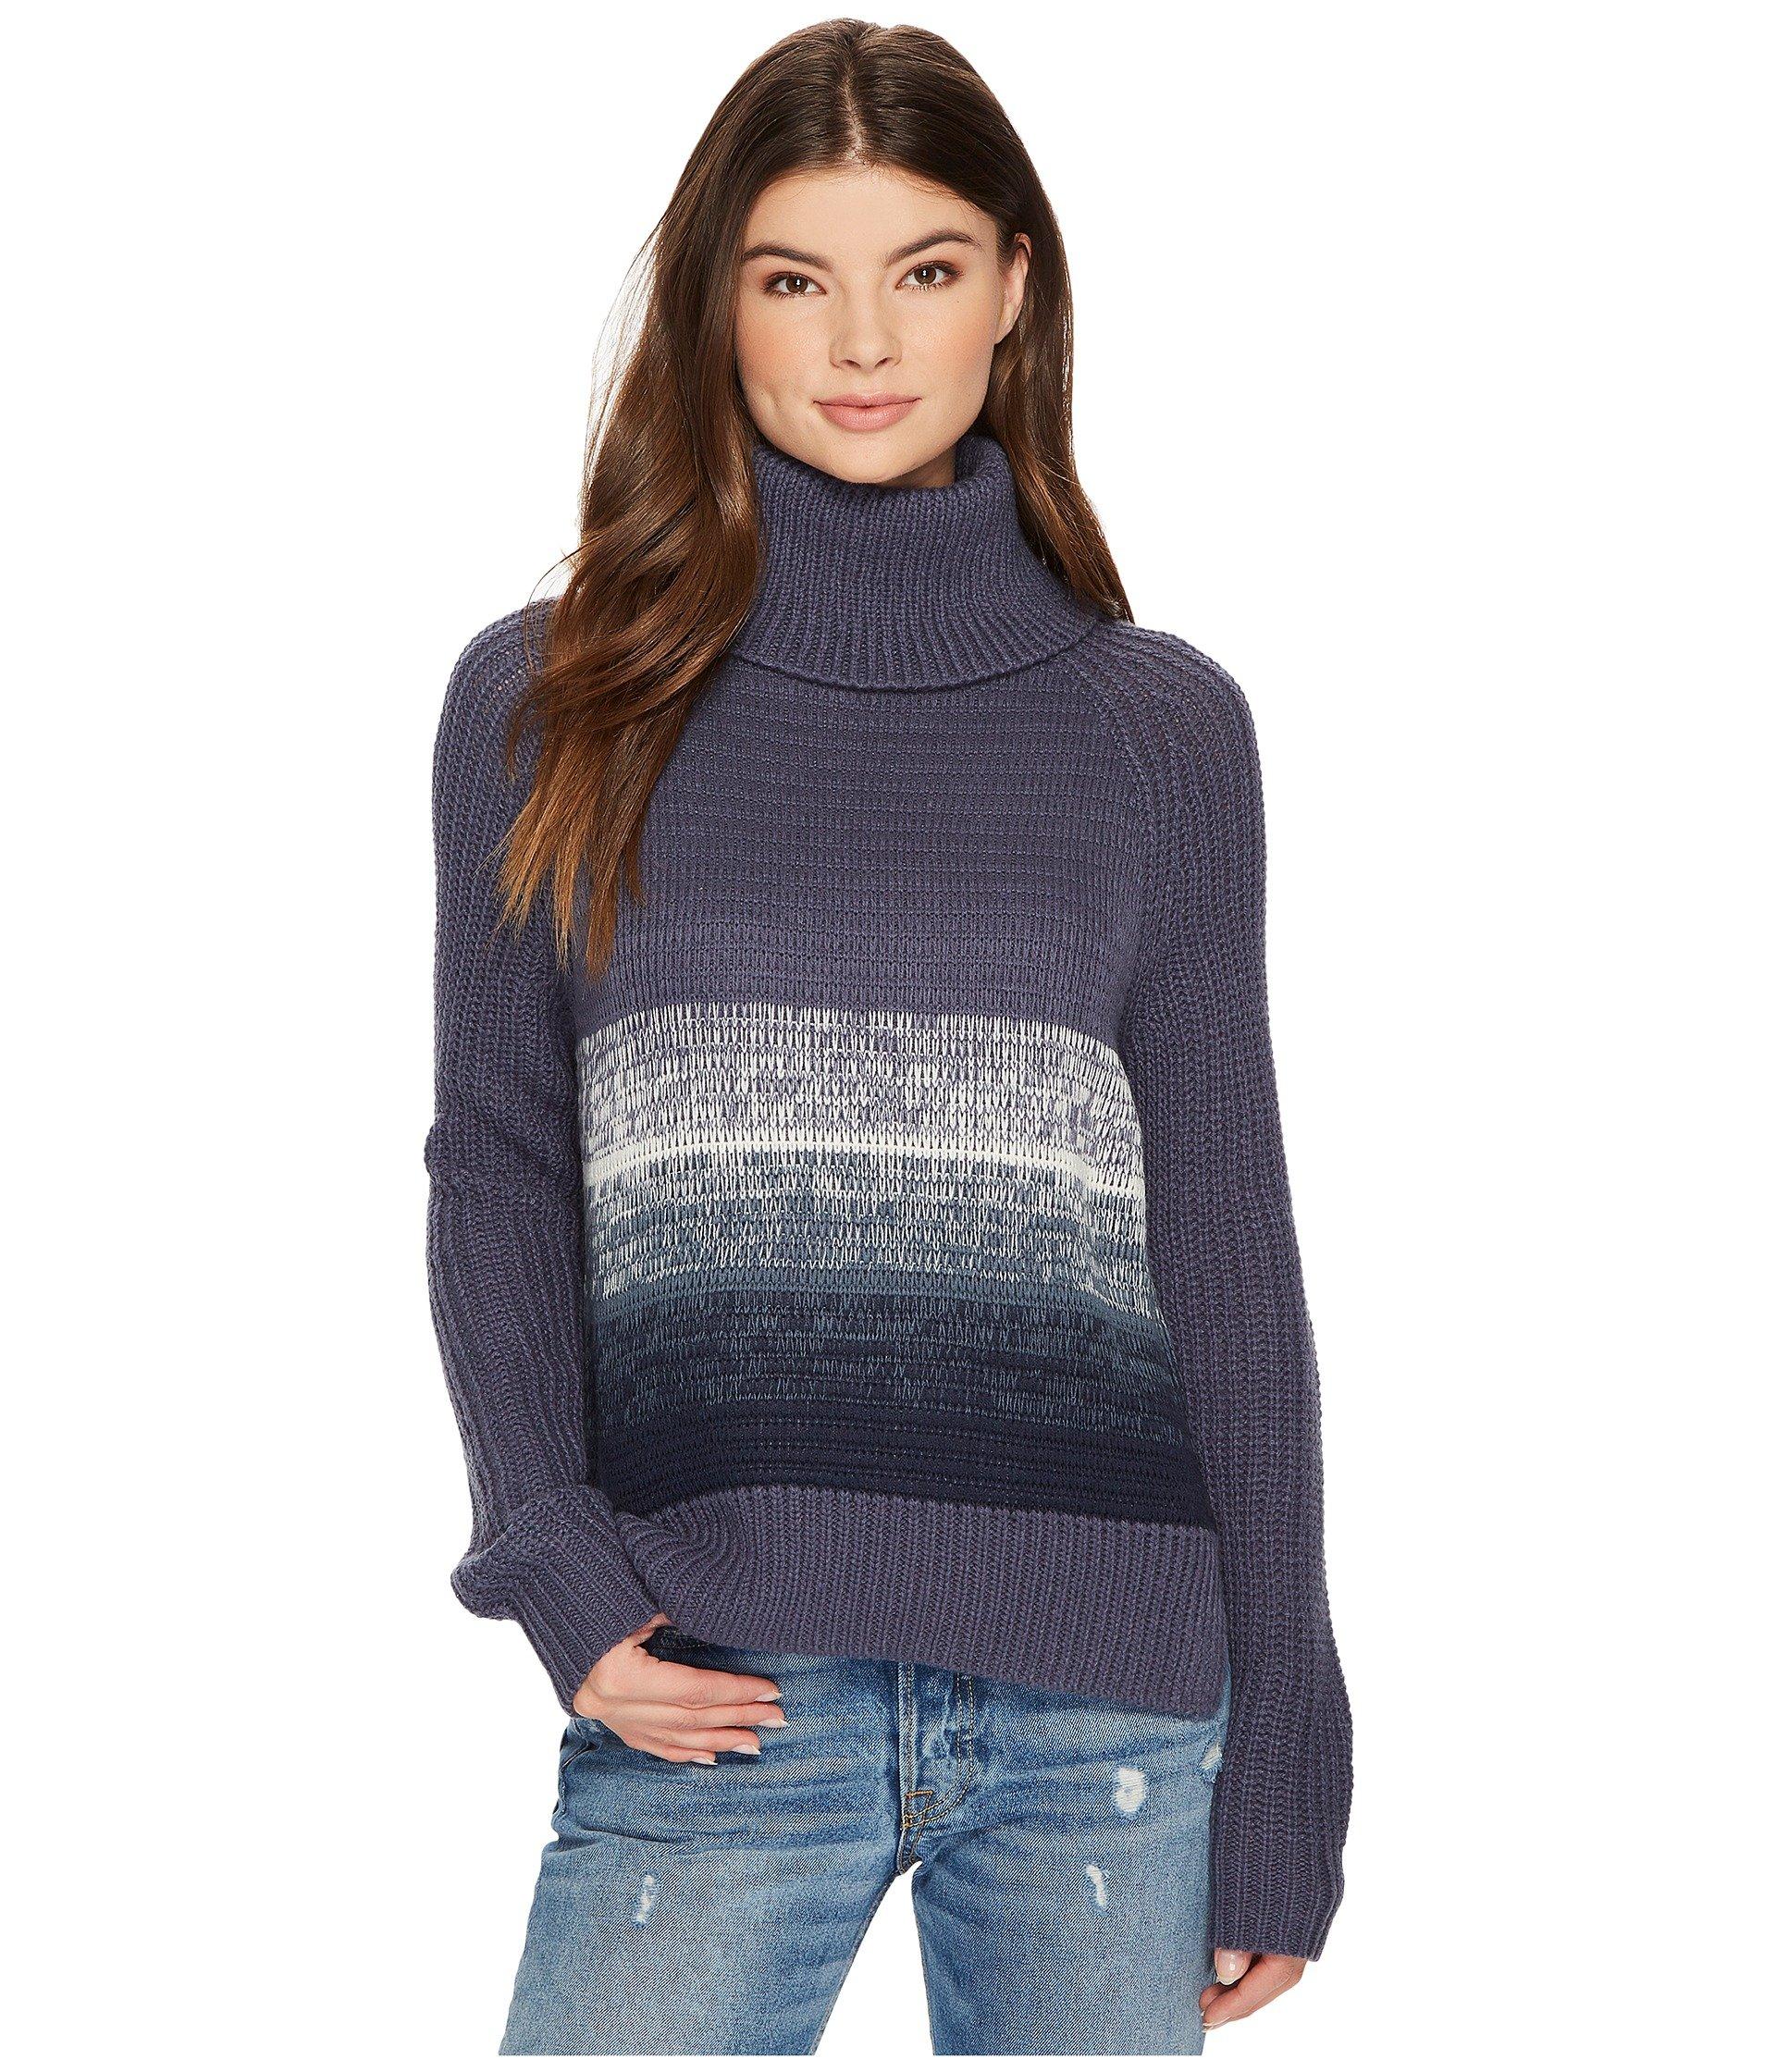 Morning Sun Sweater